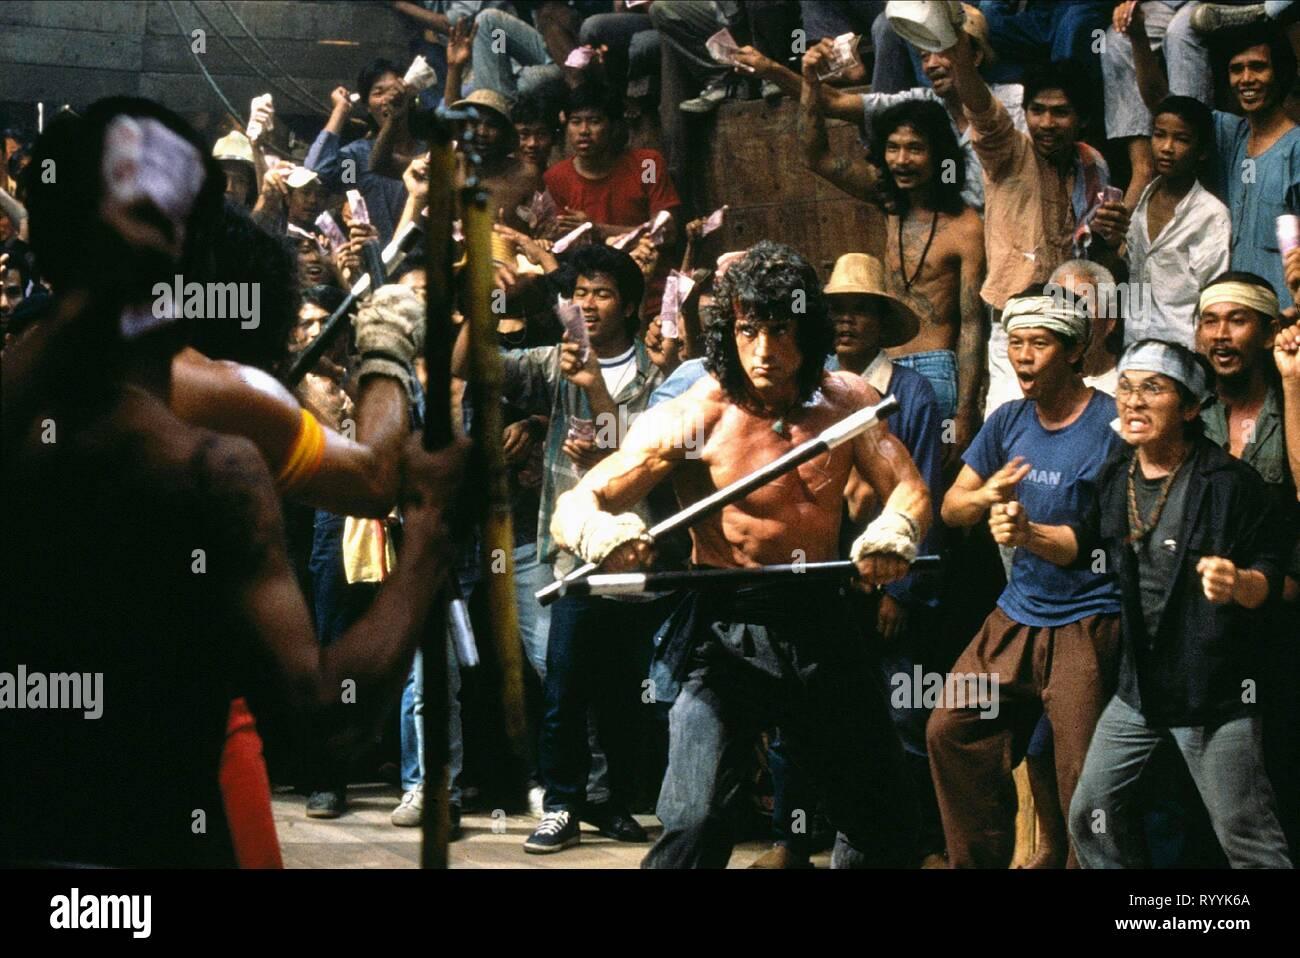 SYLVESTER STALLONE, RAMBO III, 1988 - Stock Image